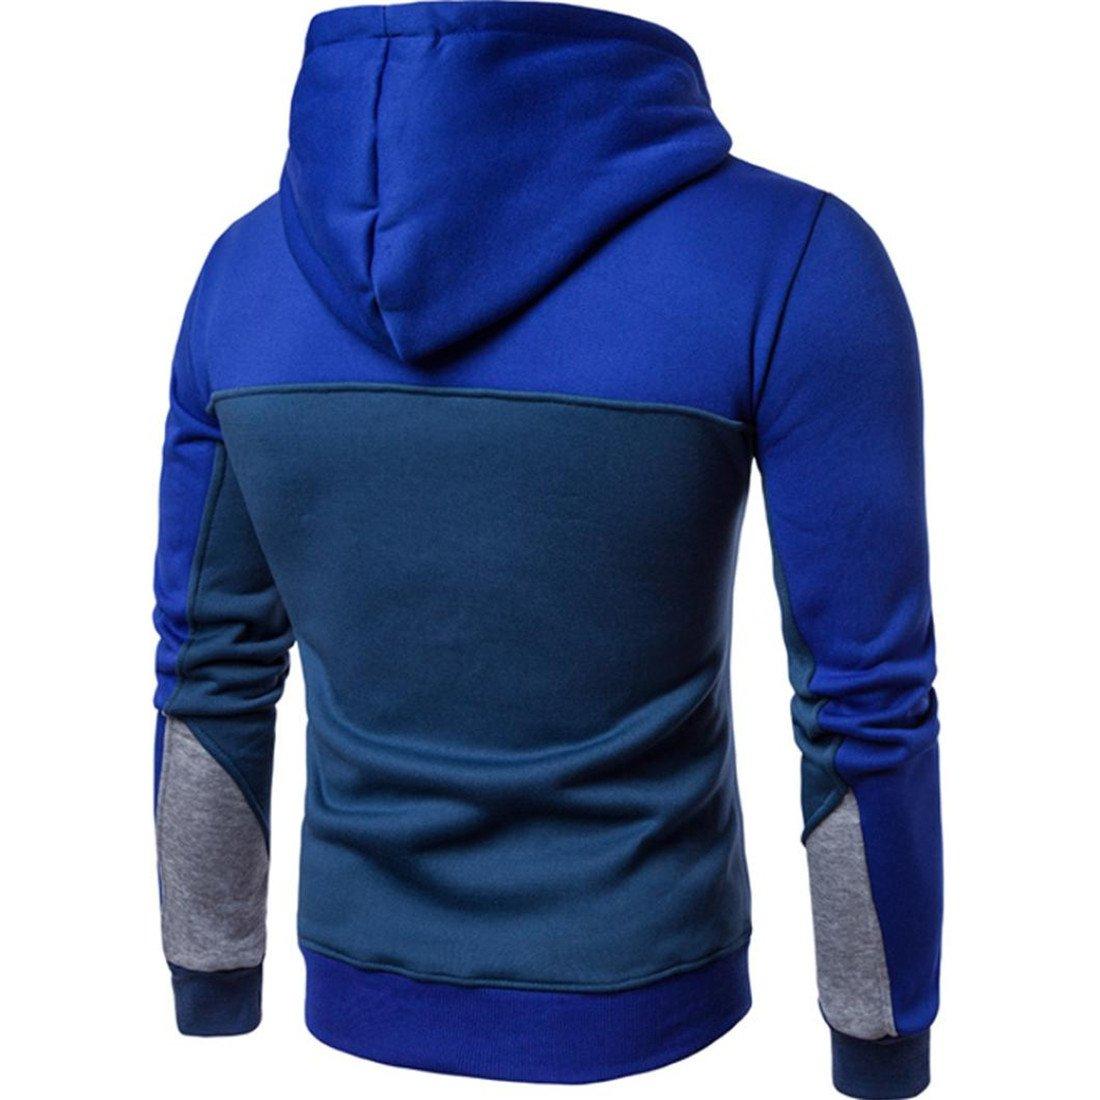 Btruely Pullover Herren Mode Patchwork Sweatshirt Lange /Ärmel Mantel Outwear